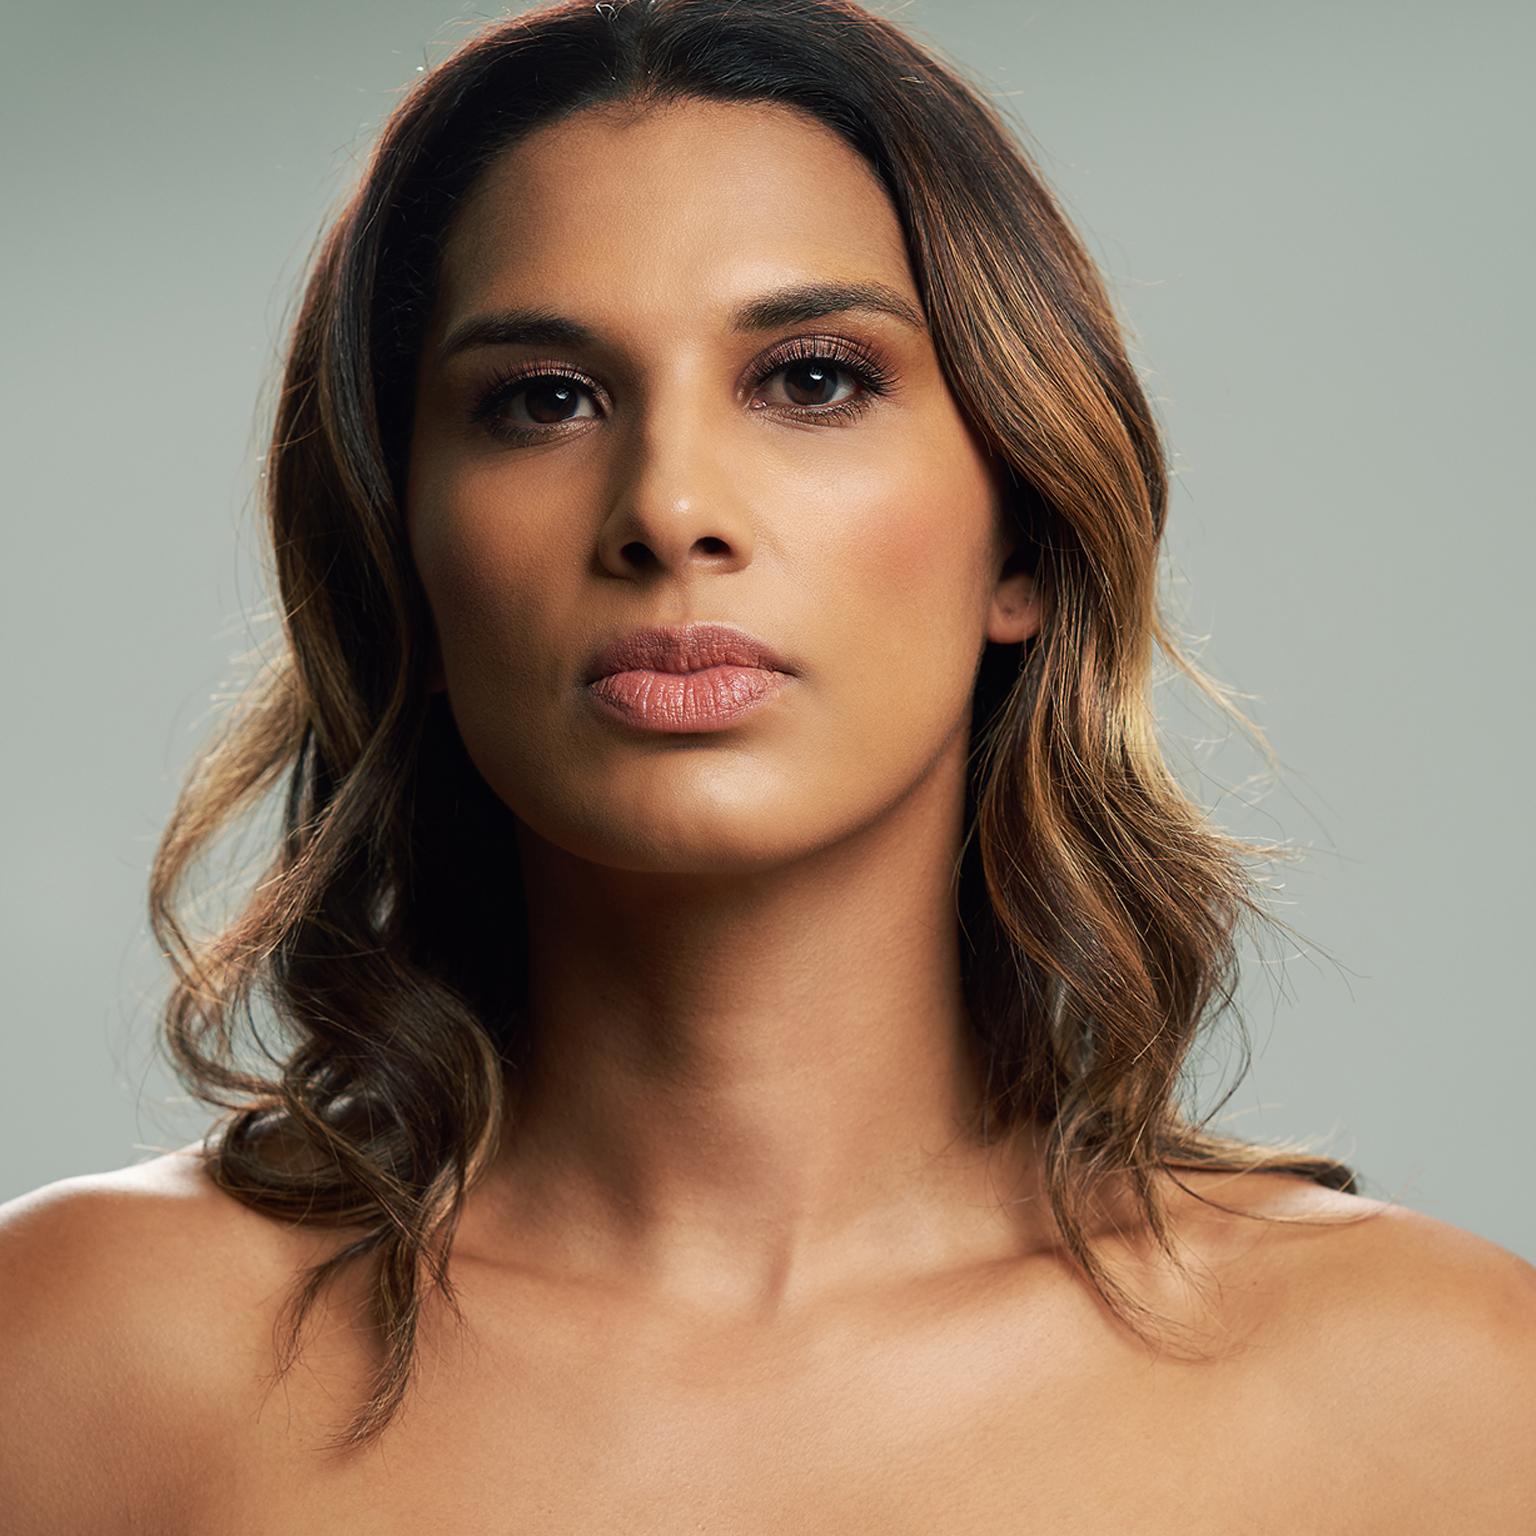 Toronto-Fitness-Model-Agency-Lifestyle-Beauty-Portrait-Valerie-Saunders